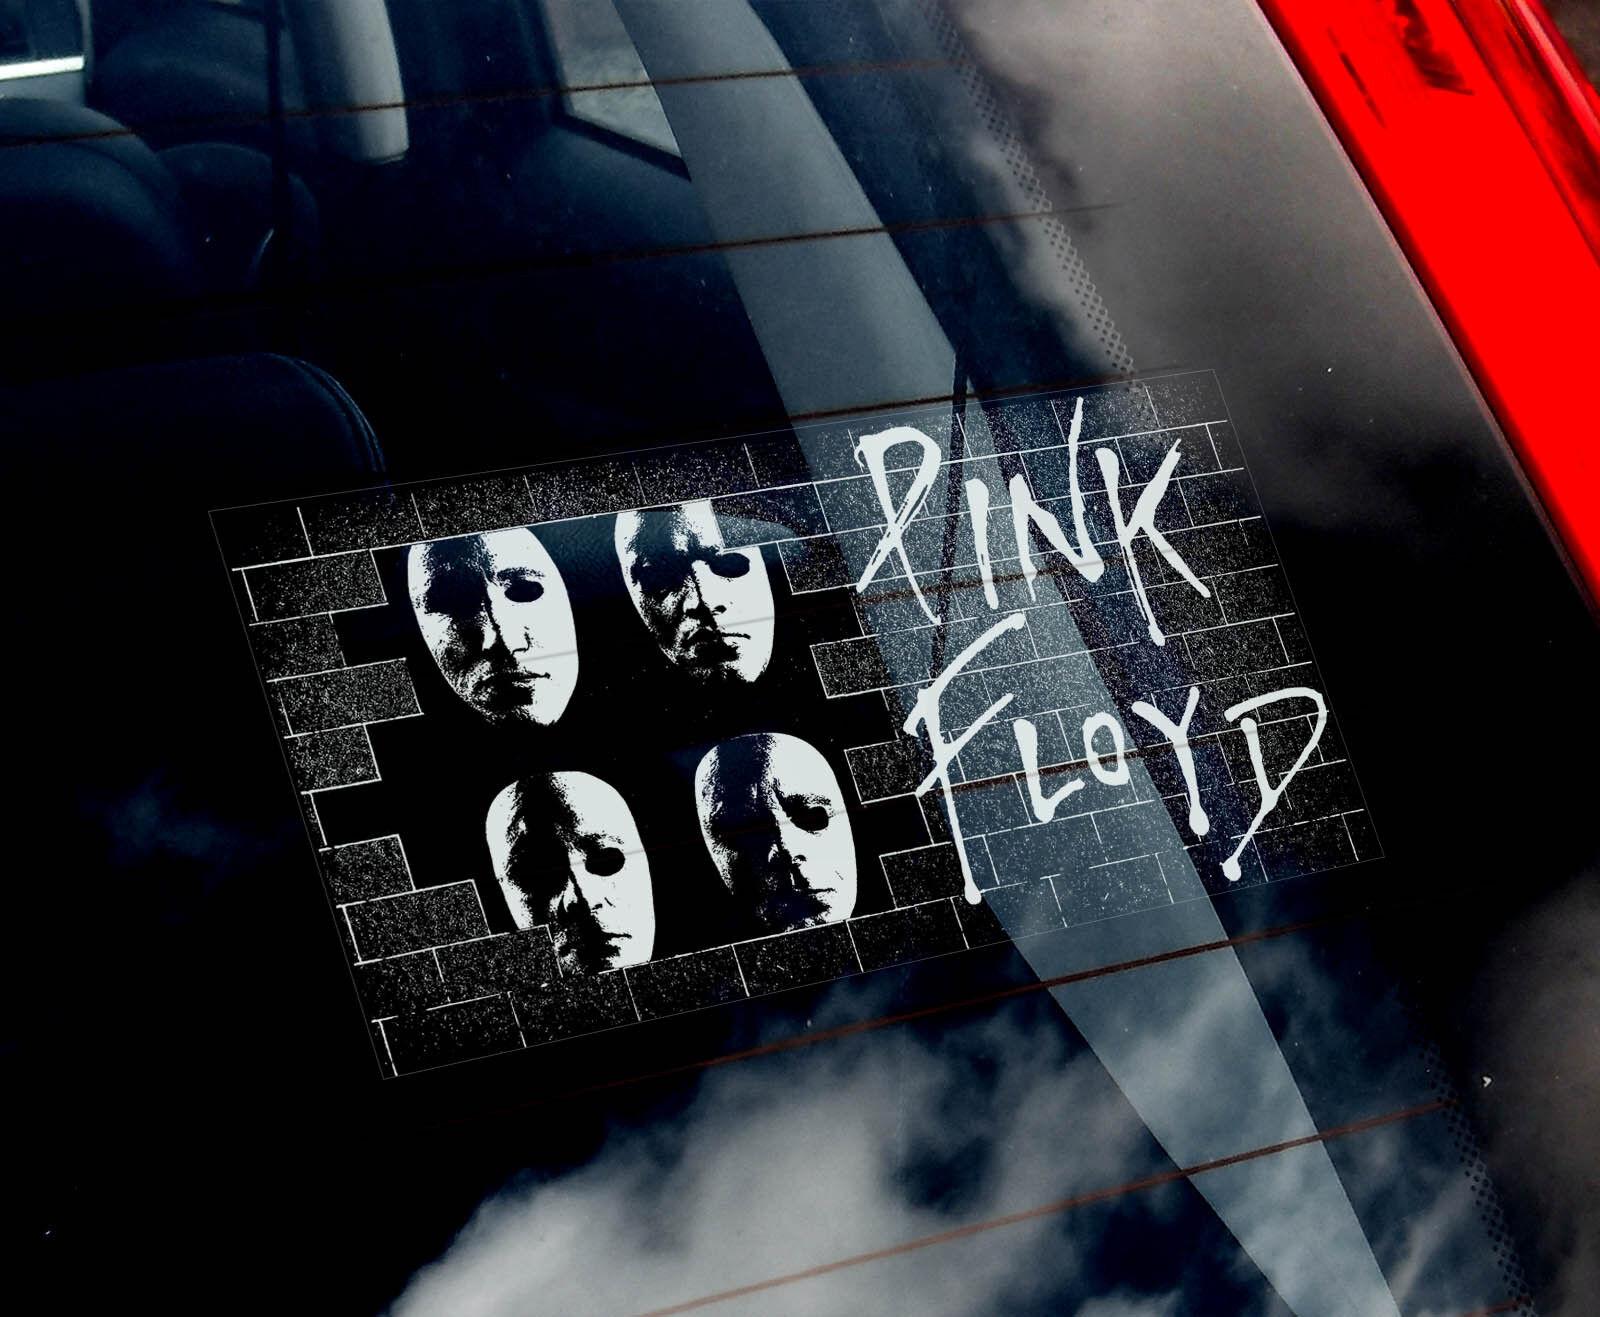 LED Zeppelin-Car Window Sticker-Band Decal Laptop Rock Music Symbols